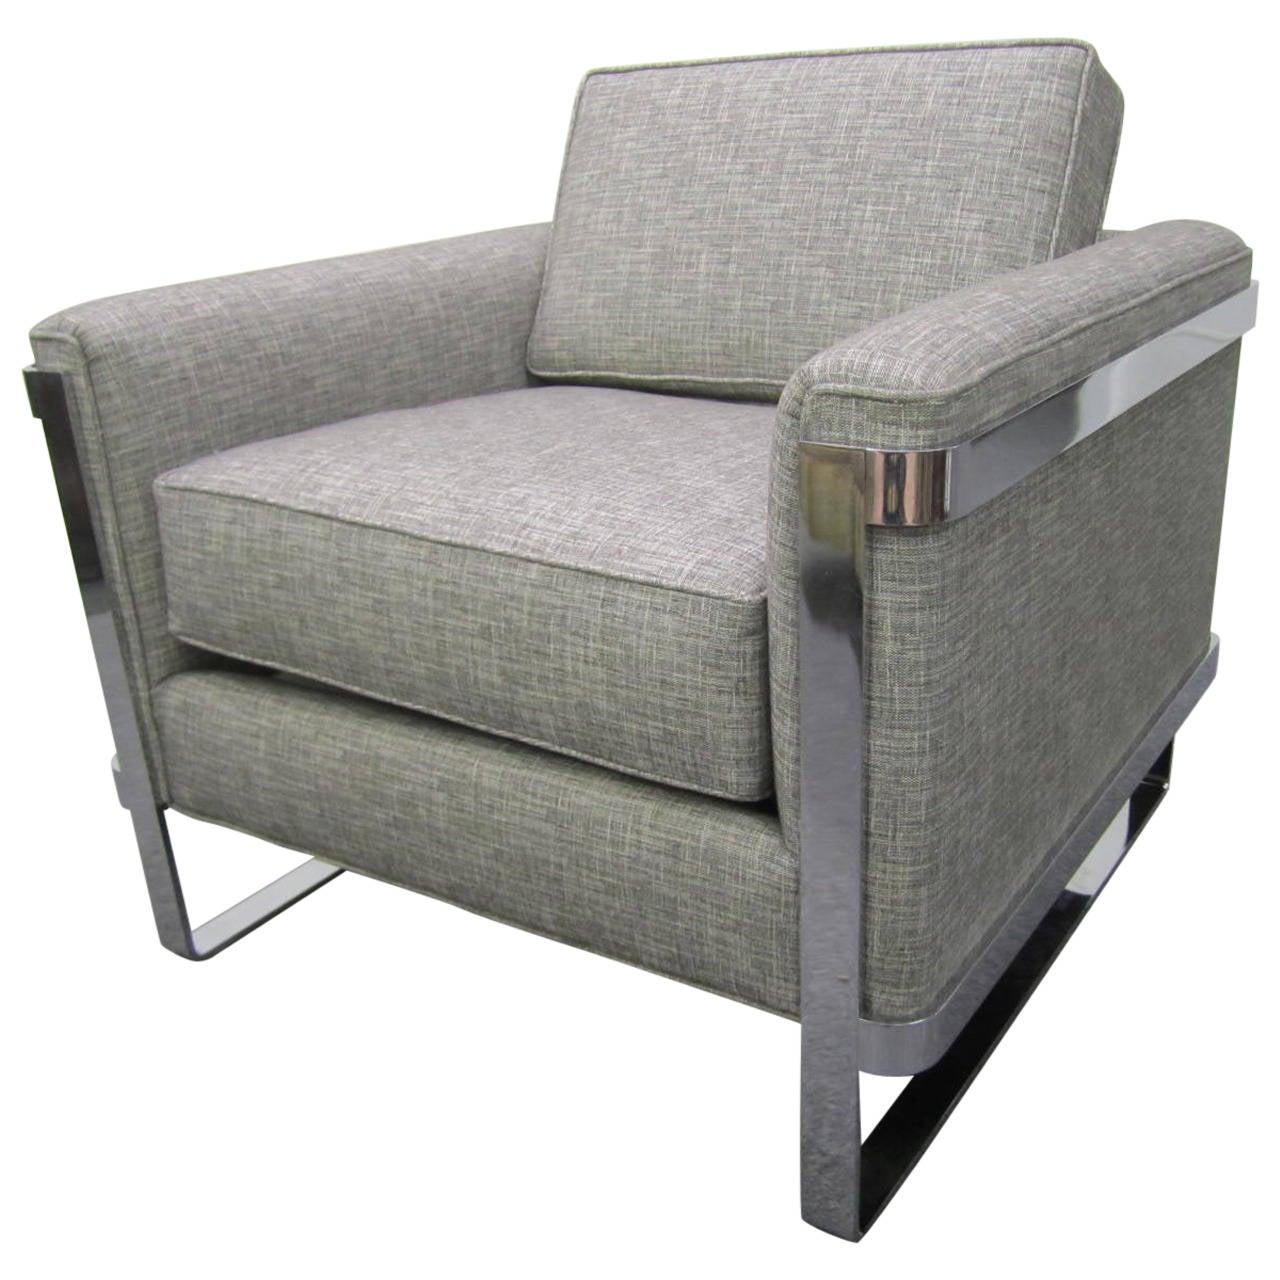 Charmant Excellent Chrome Flat Bar Lounge Chair, Mid Century Modern